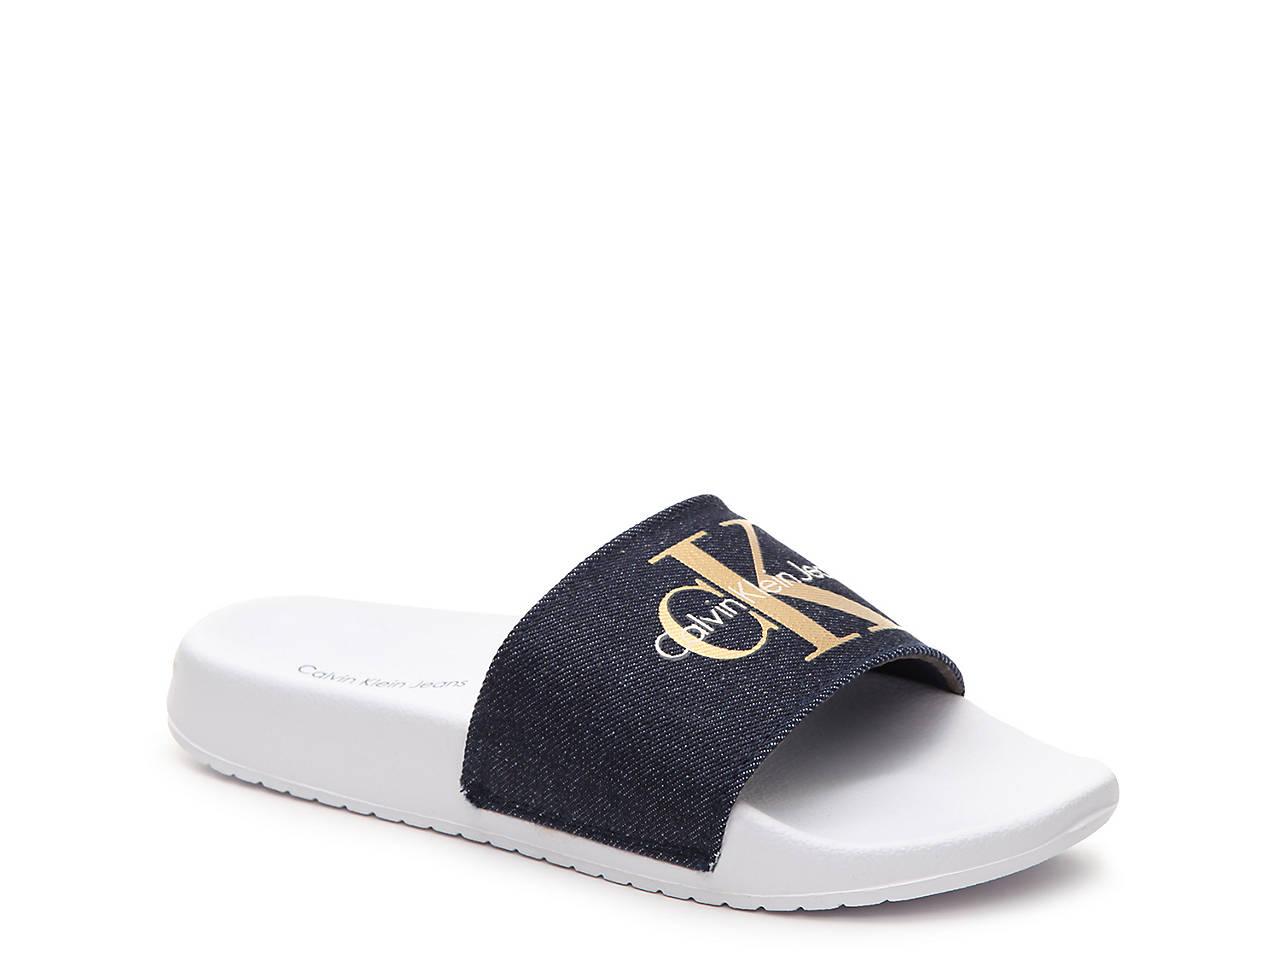 Calvin Klein Jeans Chantal Slide Sandal Women'S Shoes Dsw Calvin Klein Flip Flops Womens Shoes